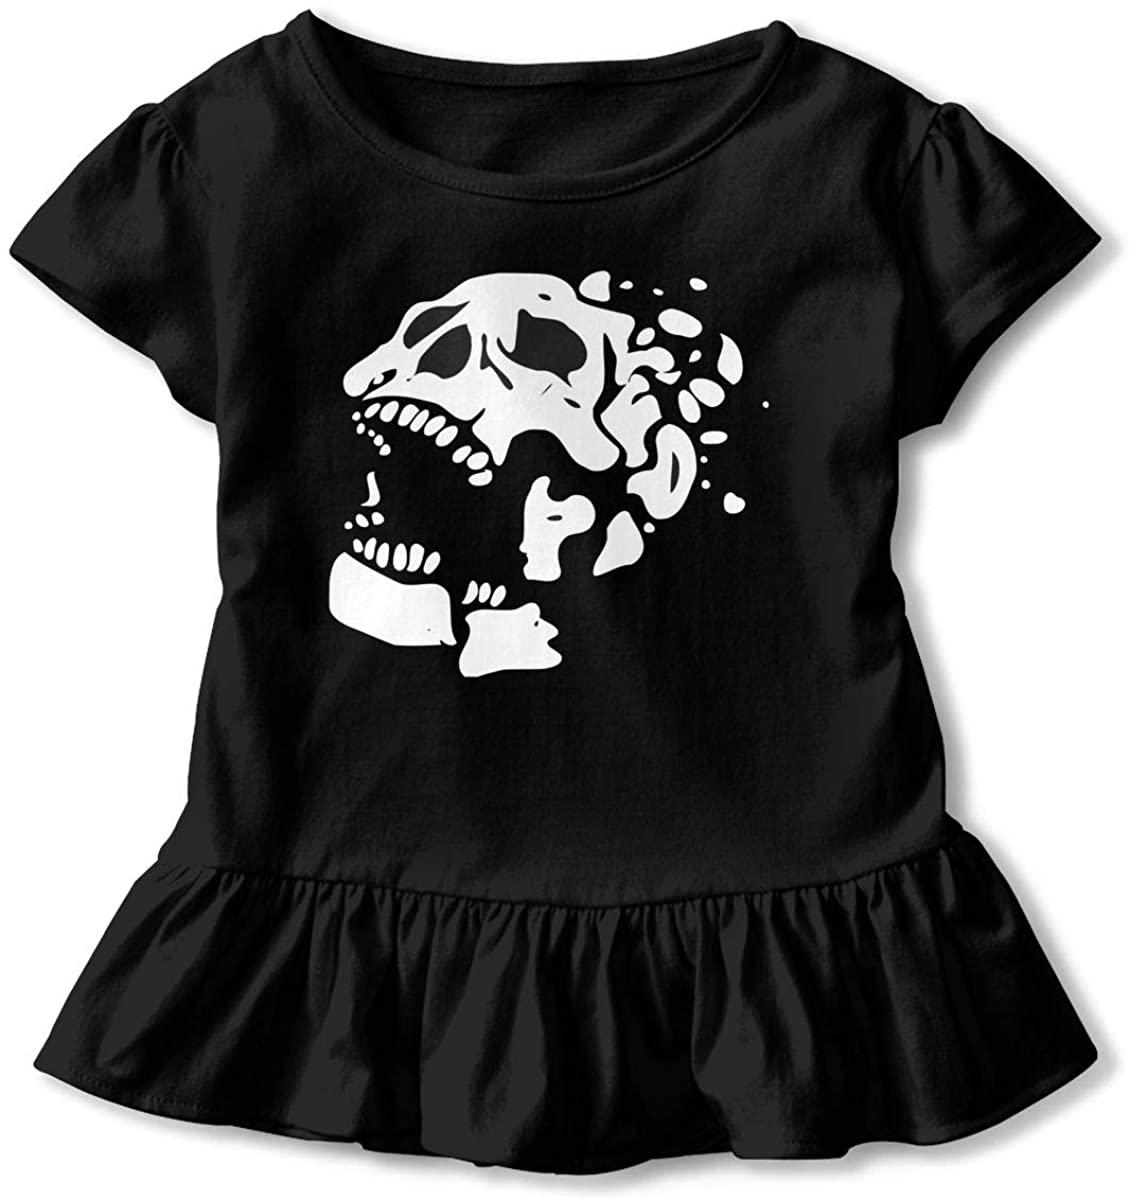 Dead-by-Daylight Toddler Girl's Ruffle T-Shirt Short Sleeve 2-6t